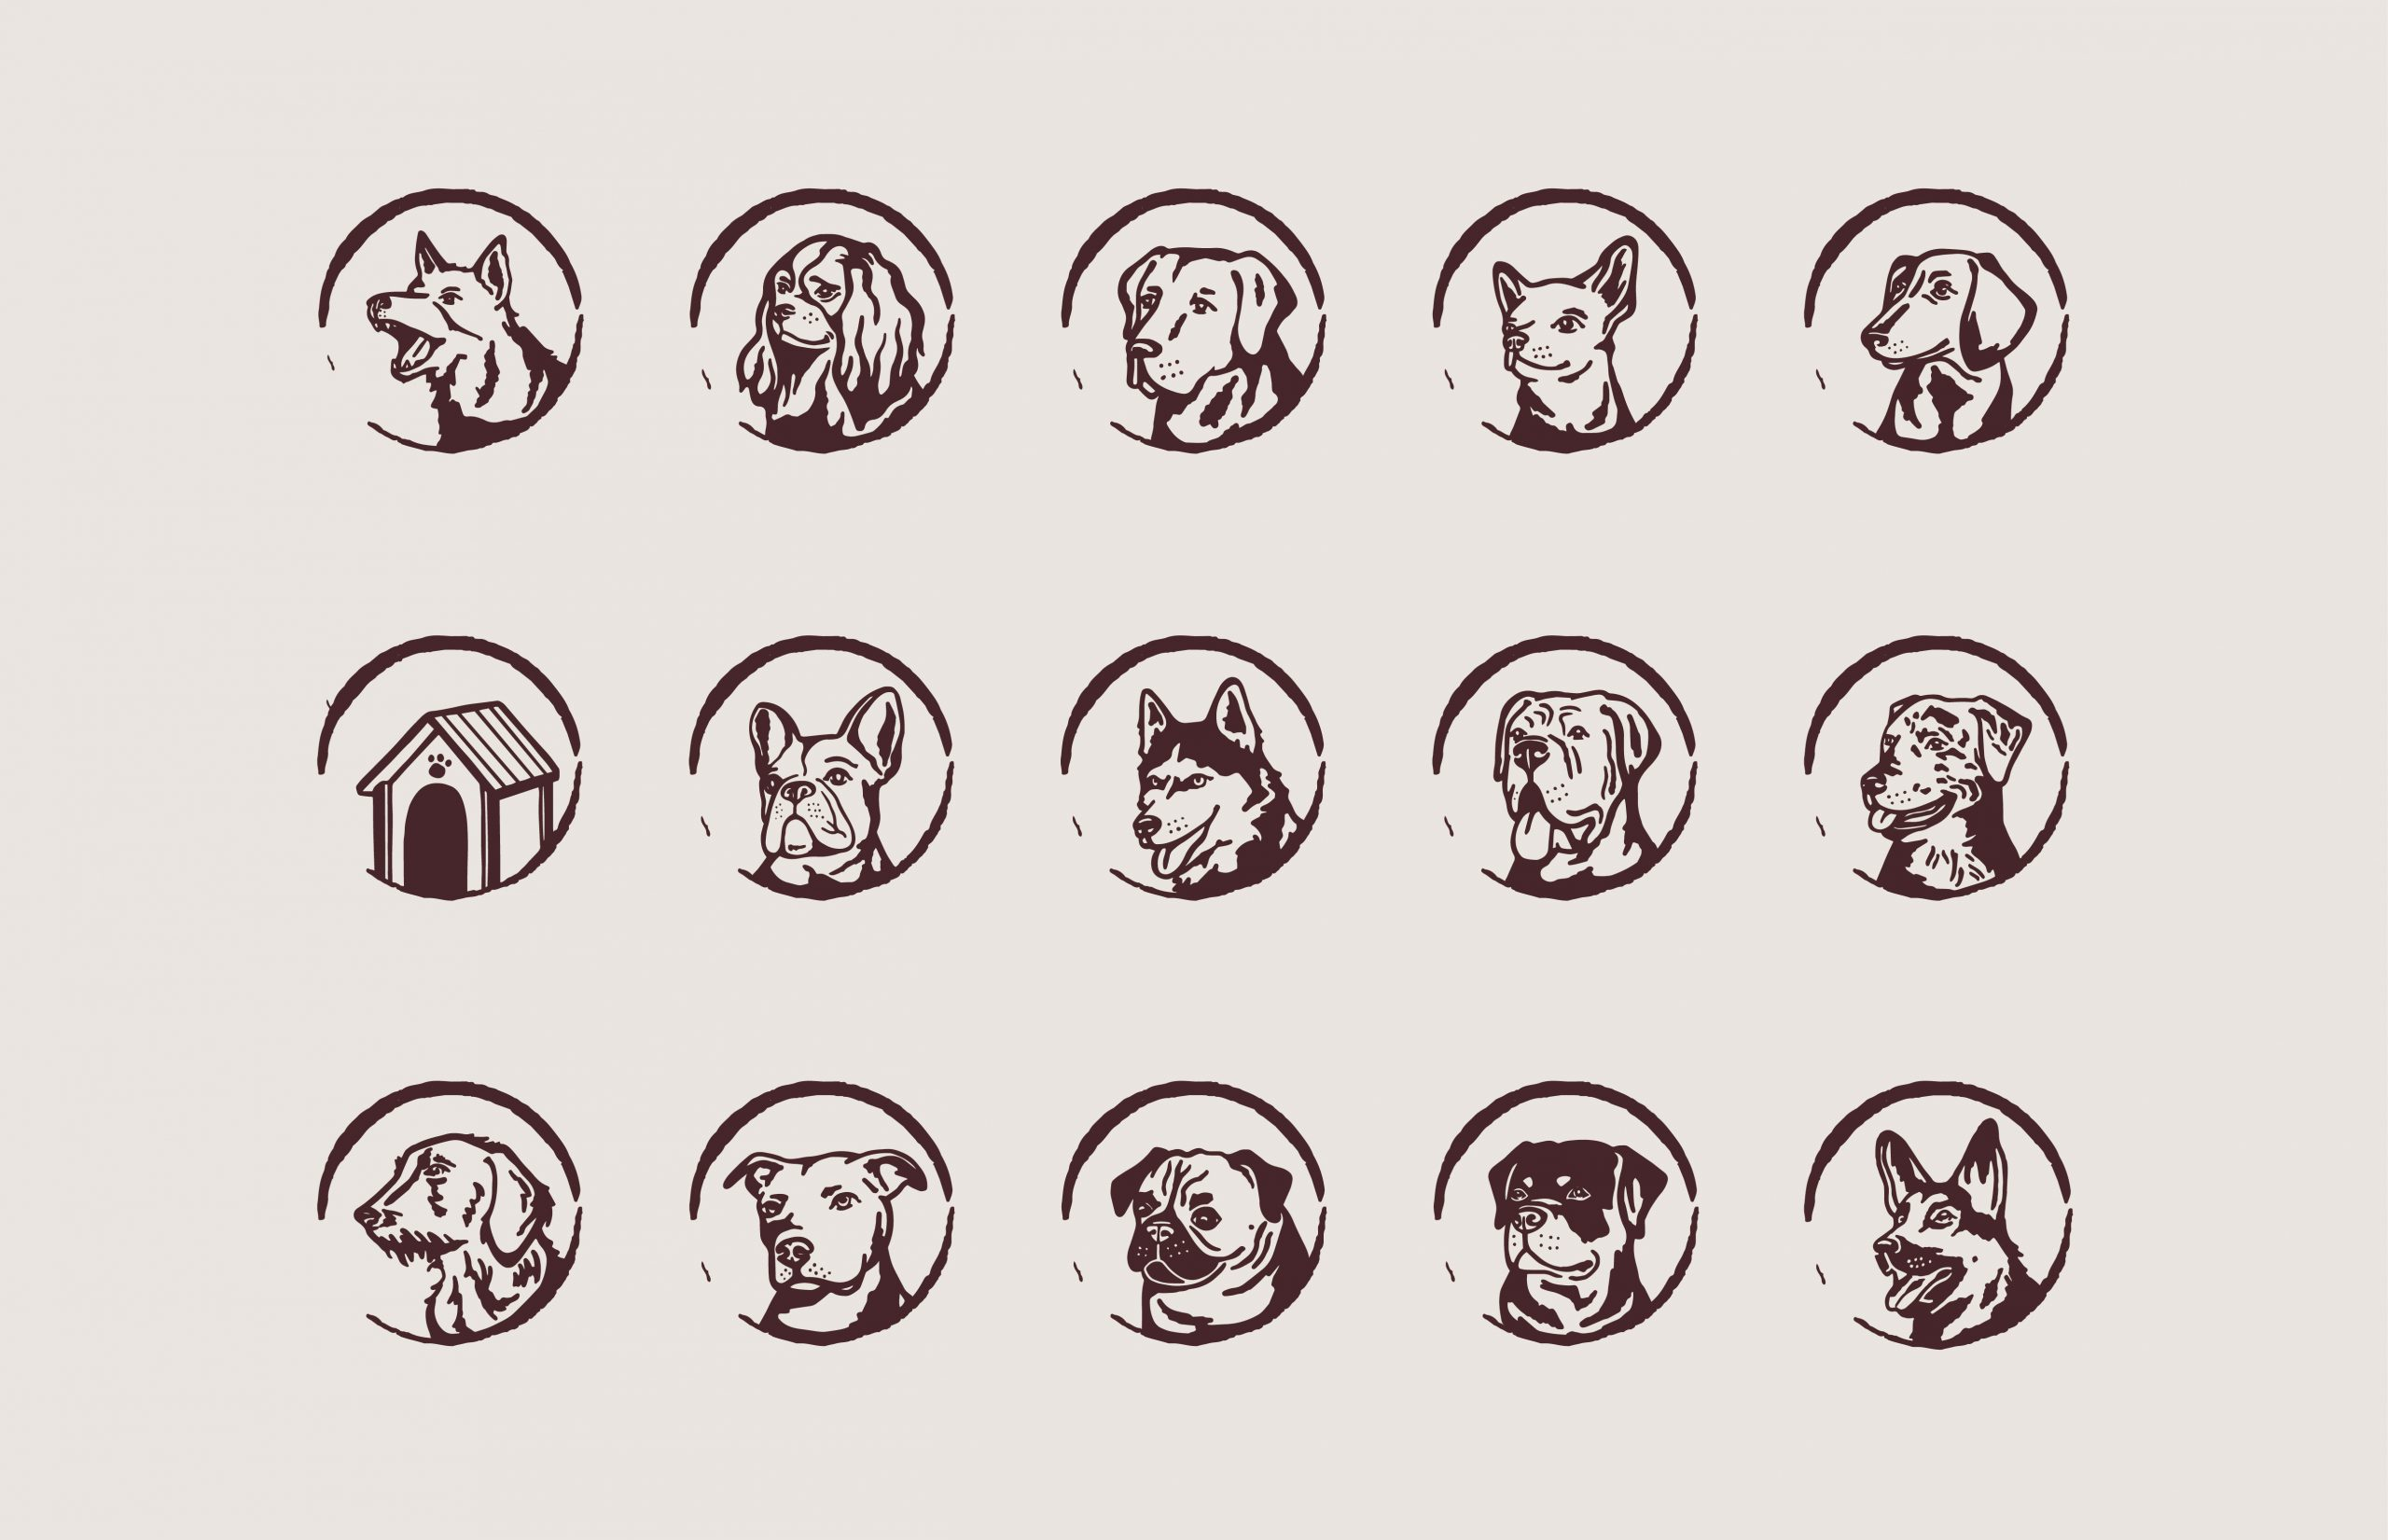 illustrations of different dog breeds